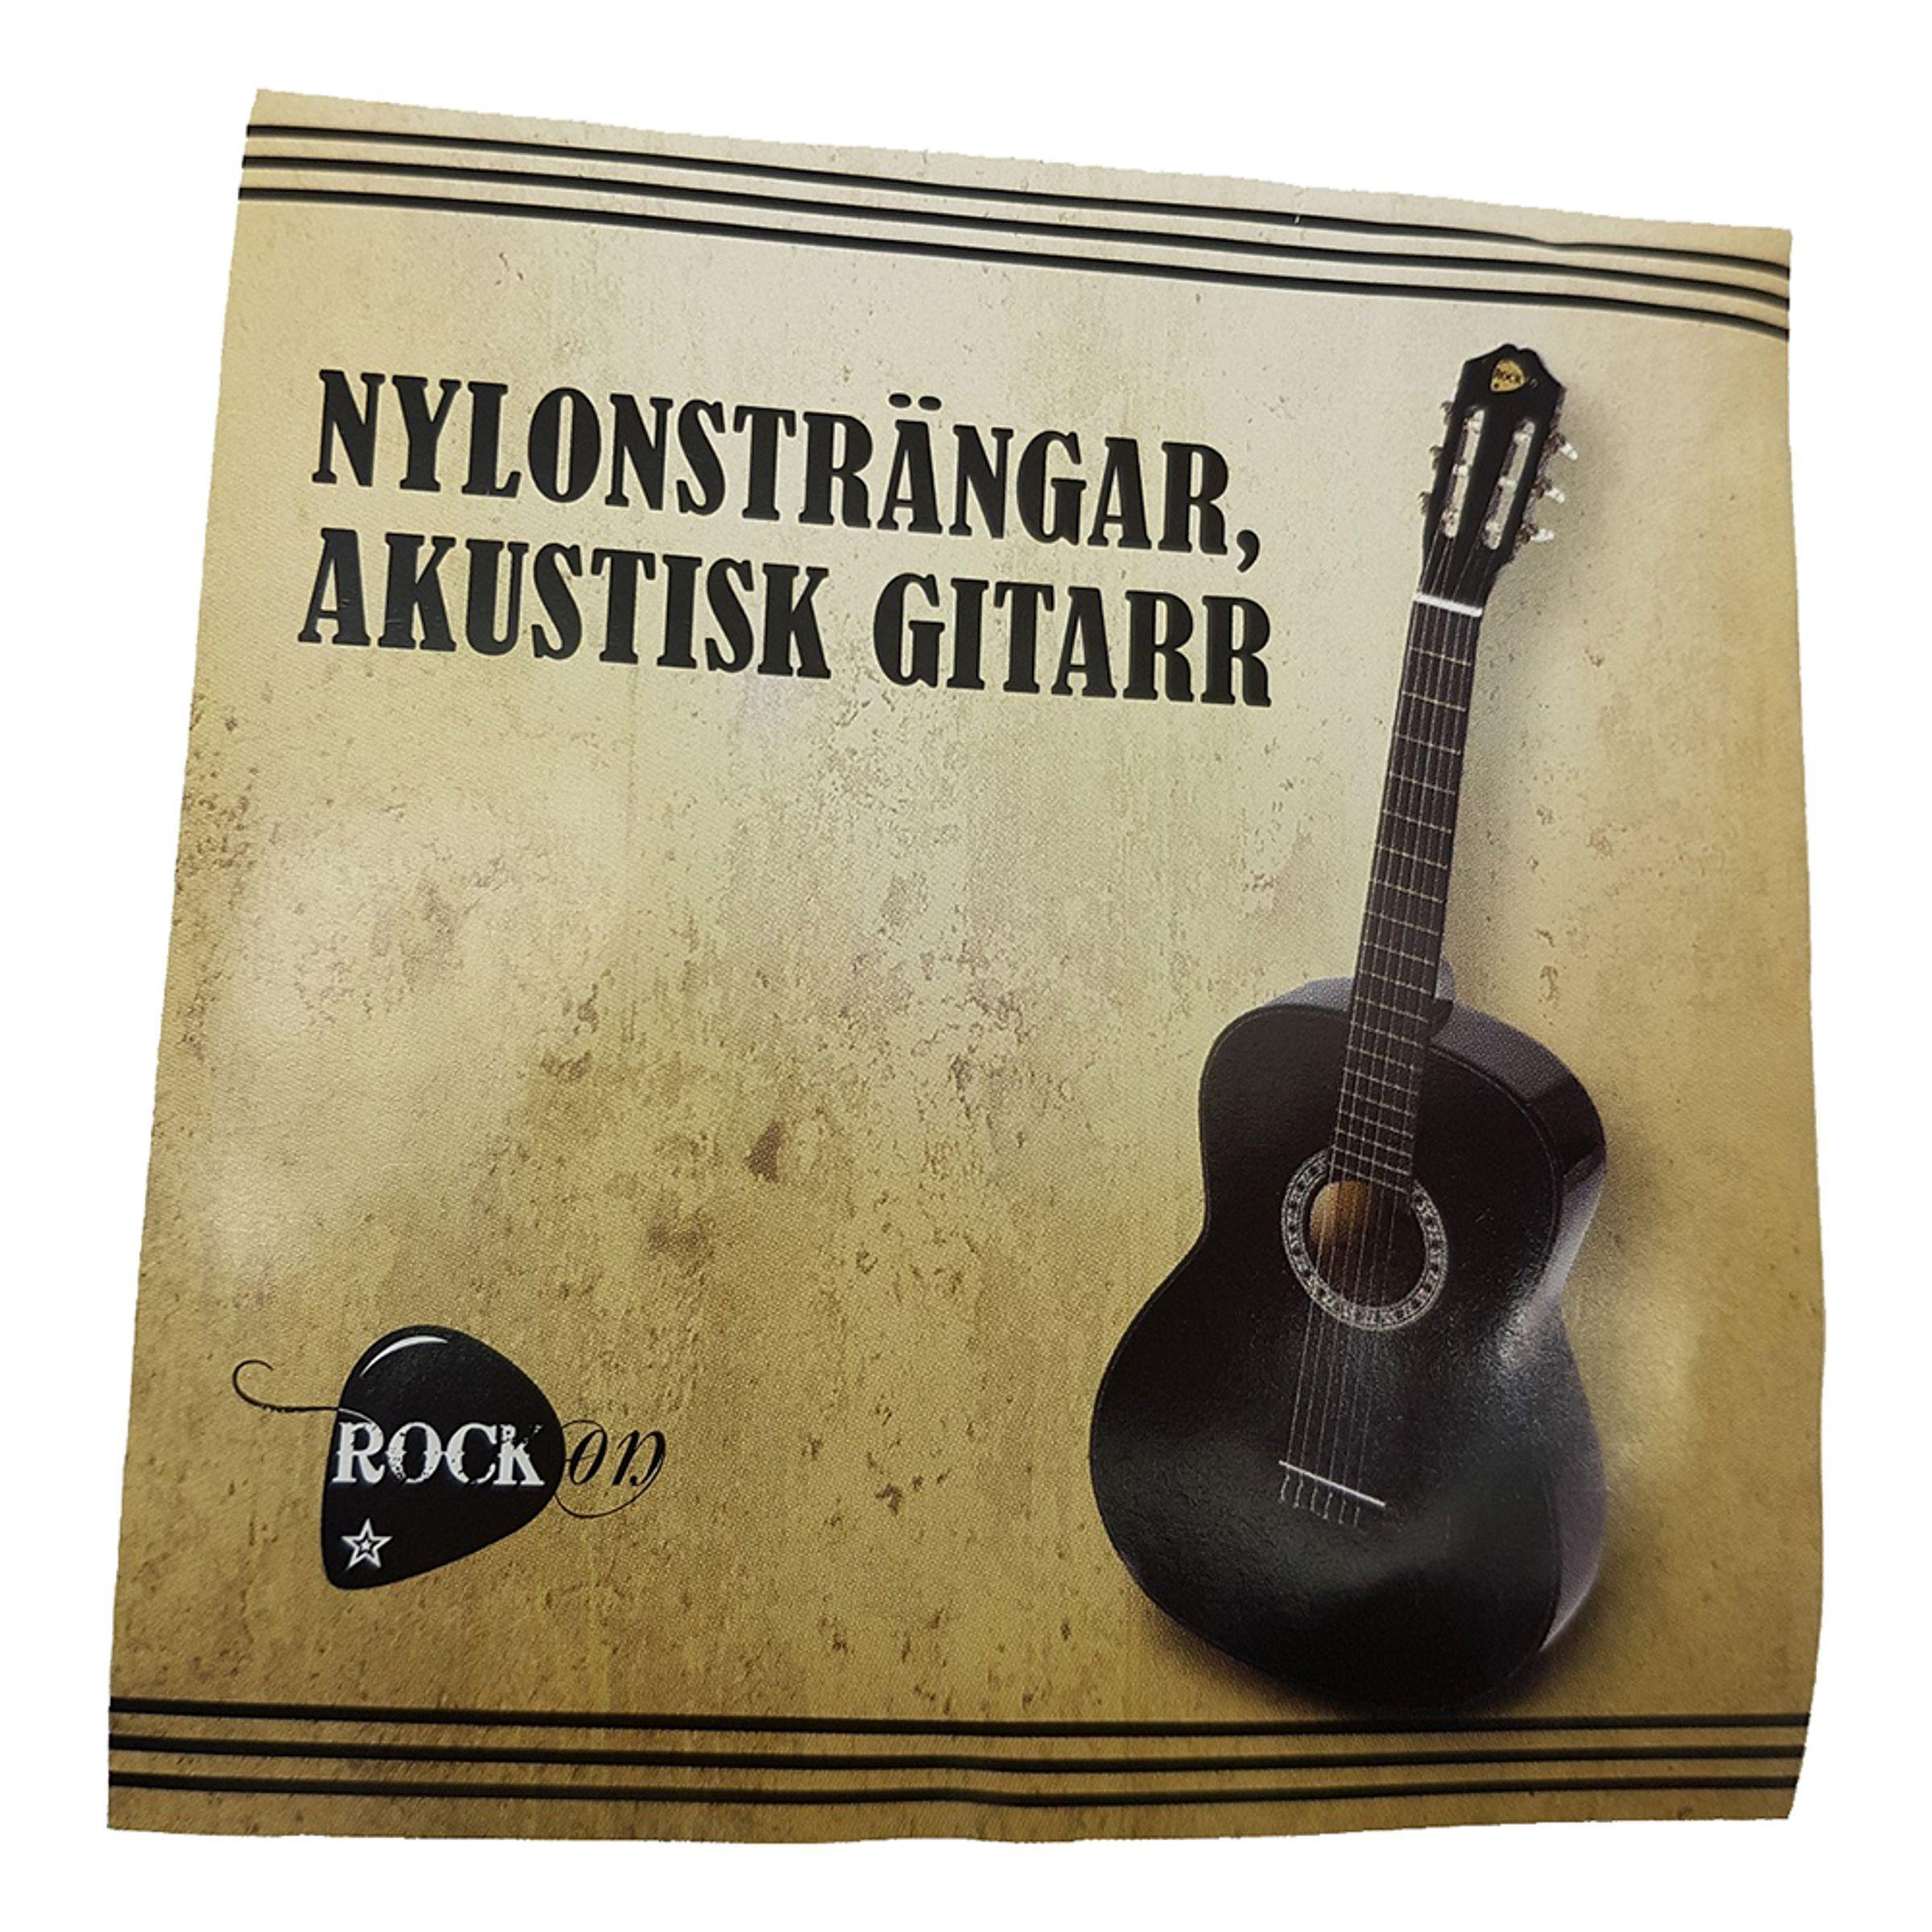 Klippex AB RockOn Guitarstrenge - Nylonstrenge